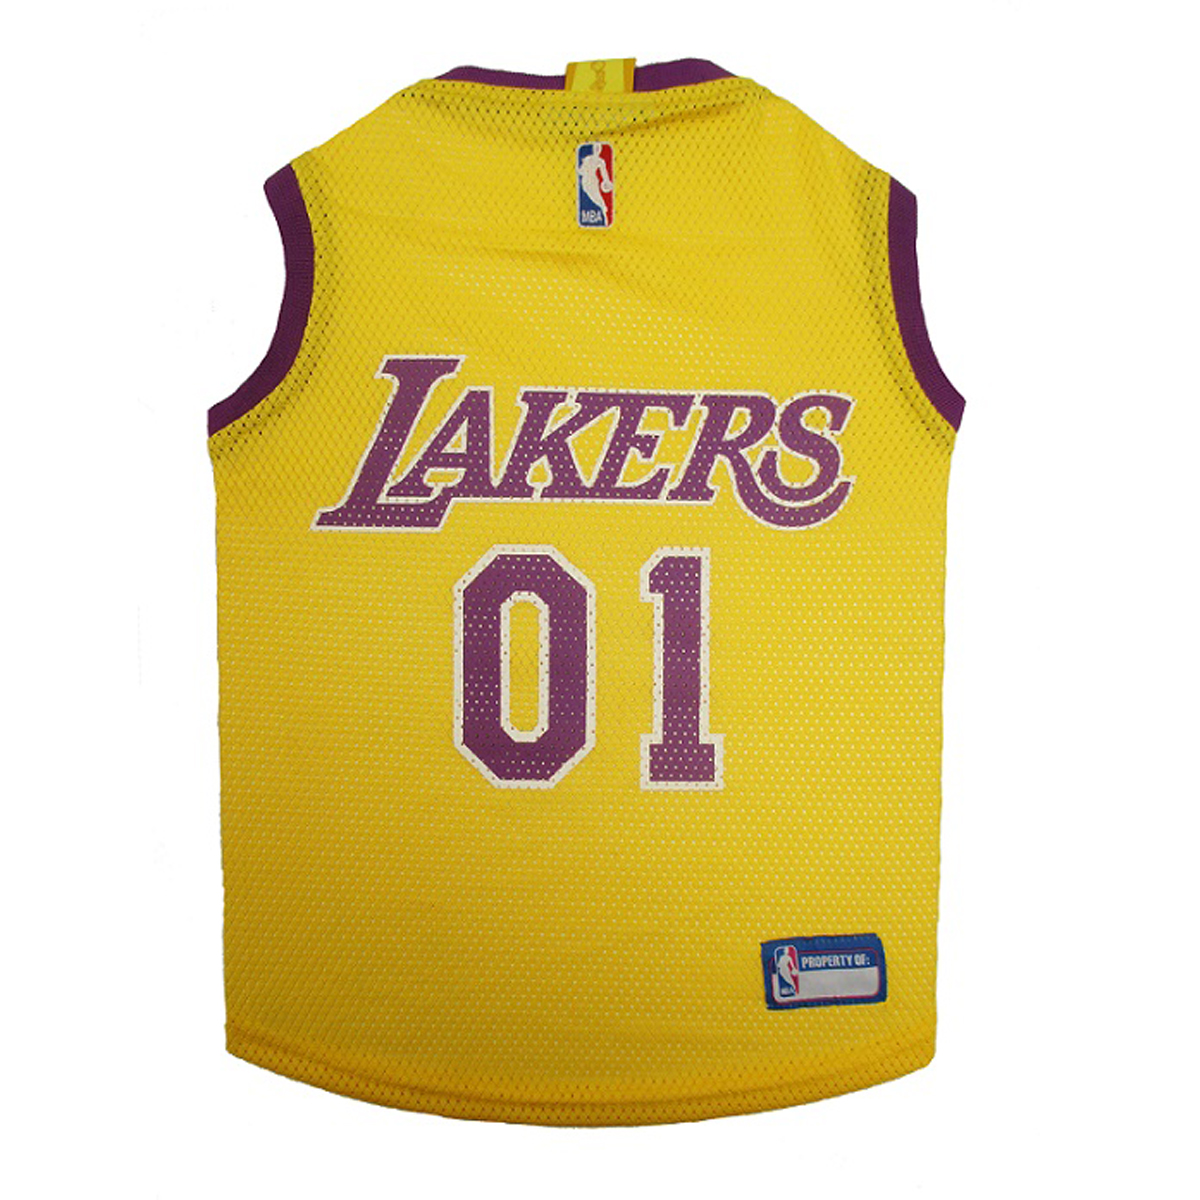 Nba Basketball Los Angeles Lakers: Los Angeles Lakers NBA Dog Jersey